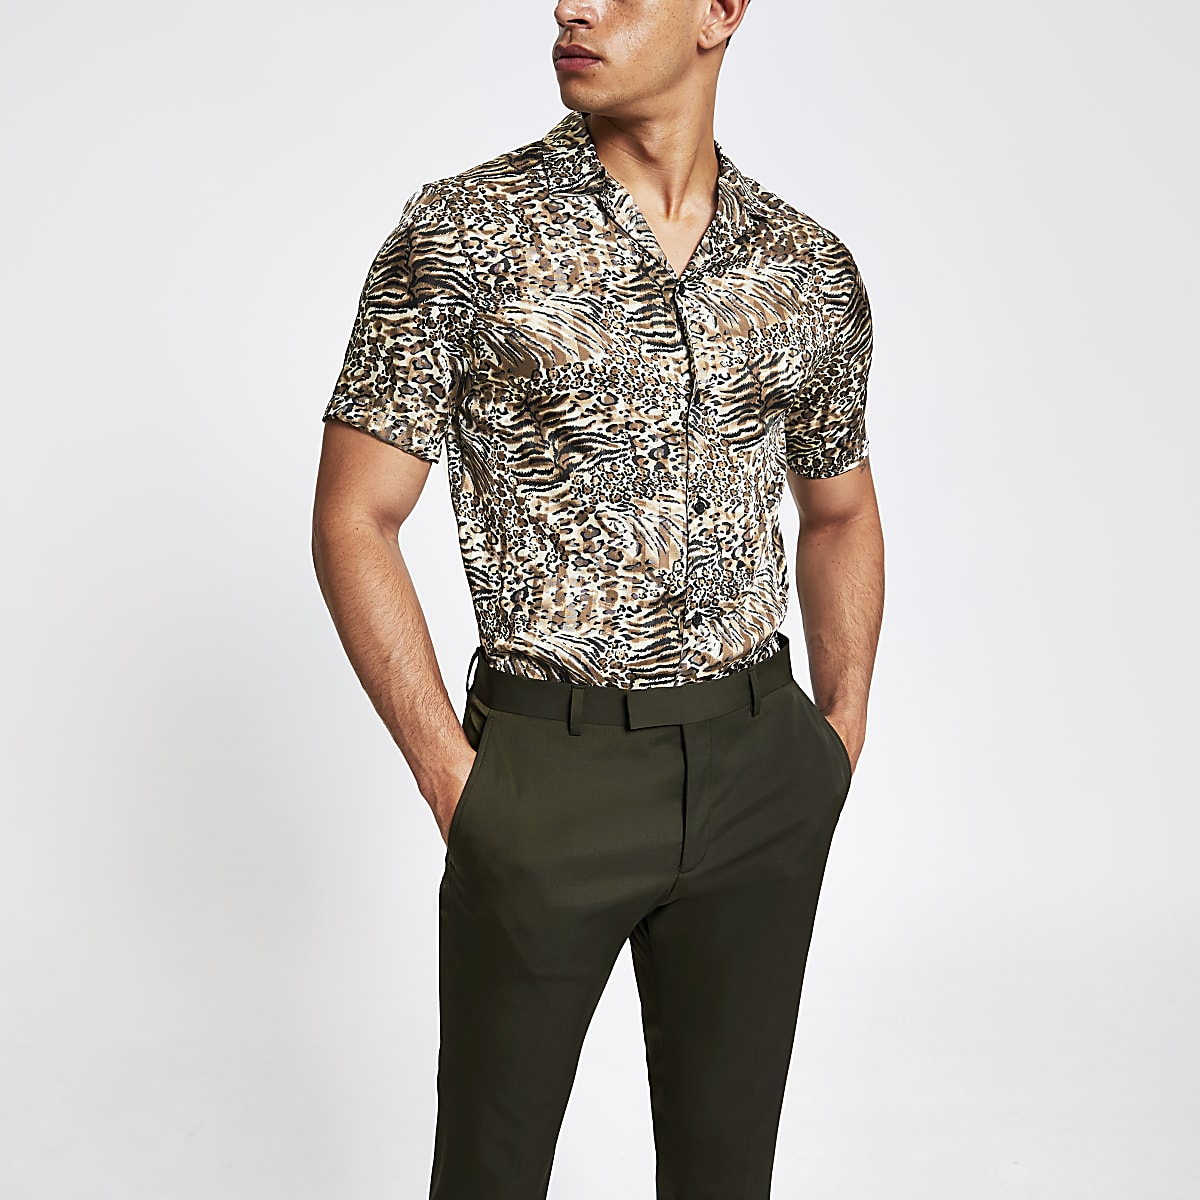 Braunes, kurzärmeliges Hemd mit Animal-Print